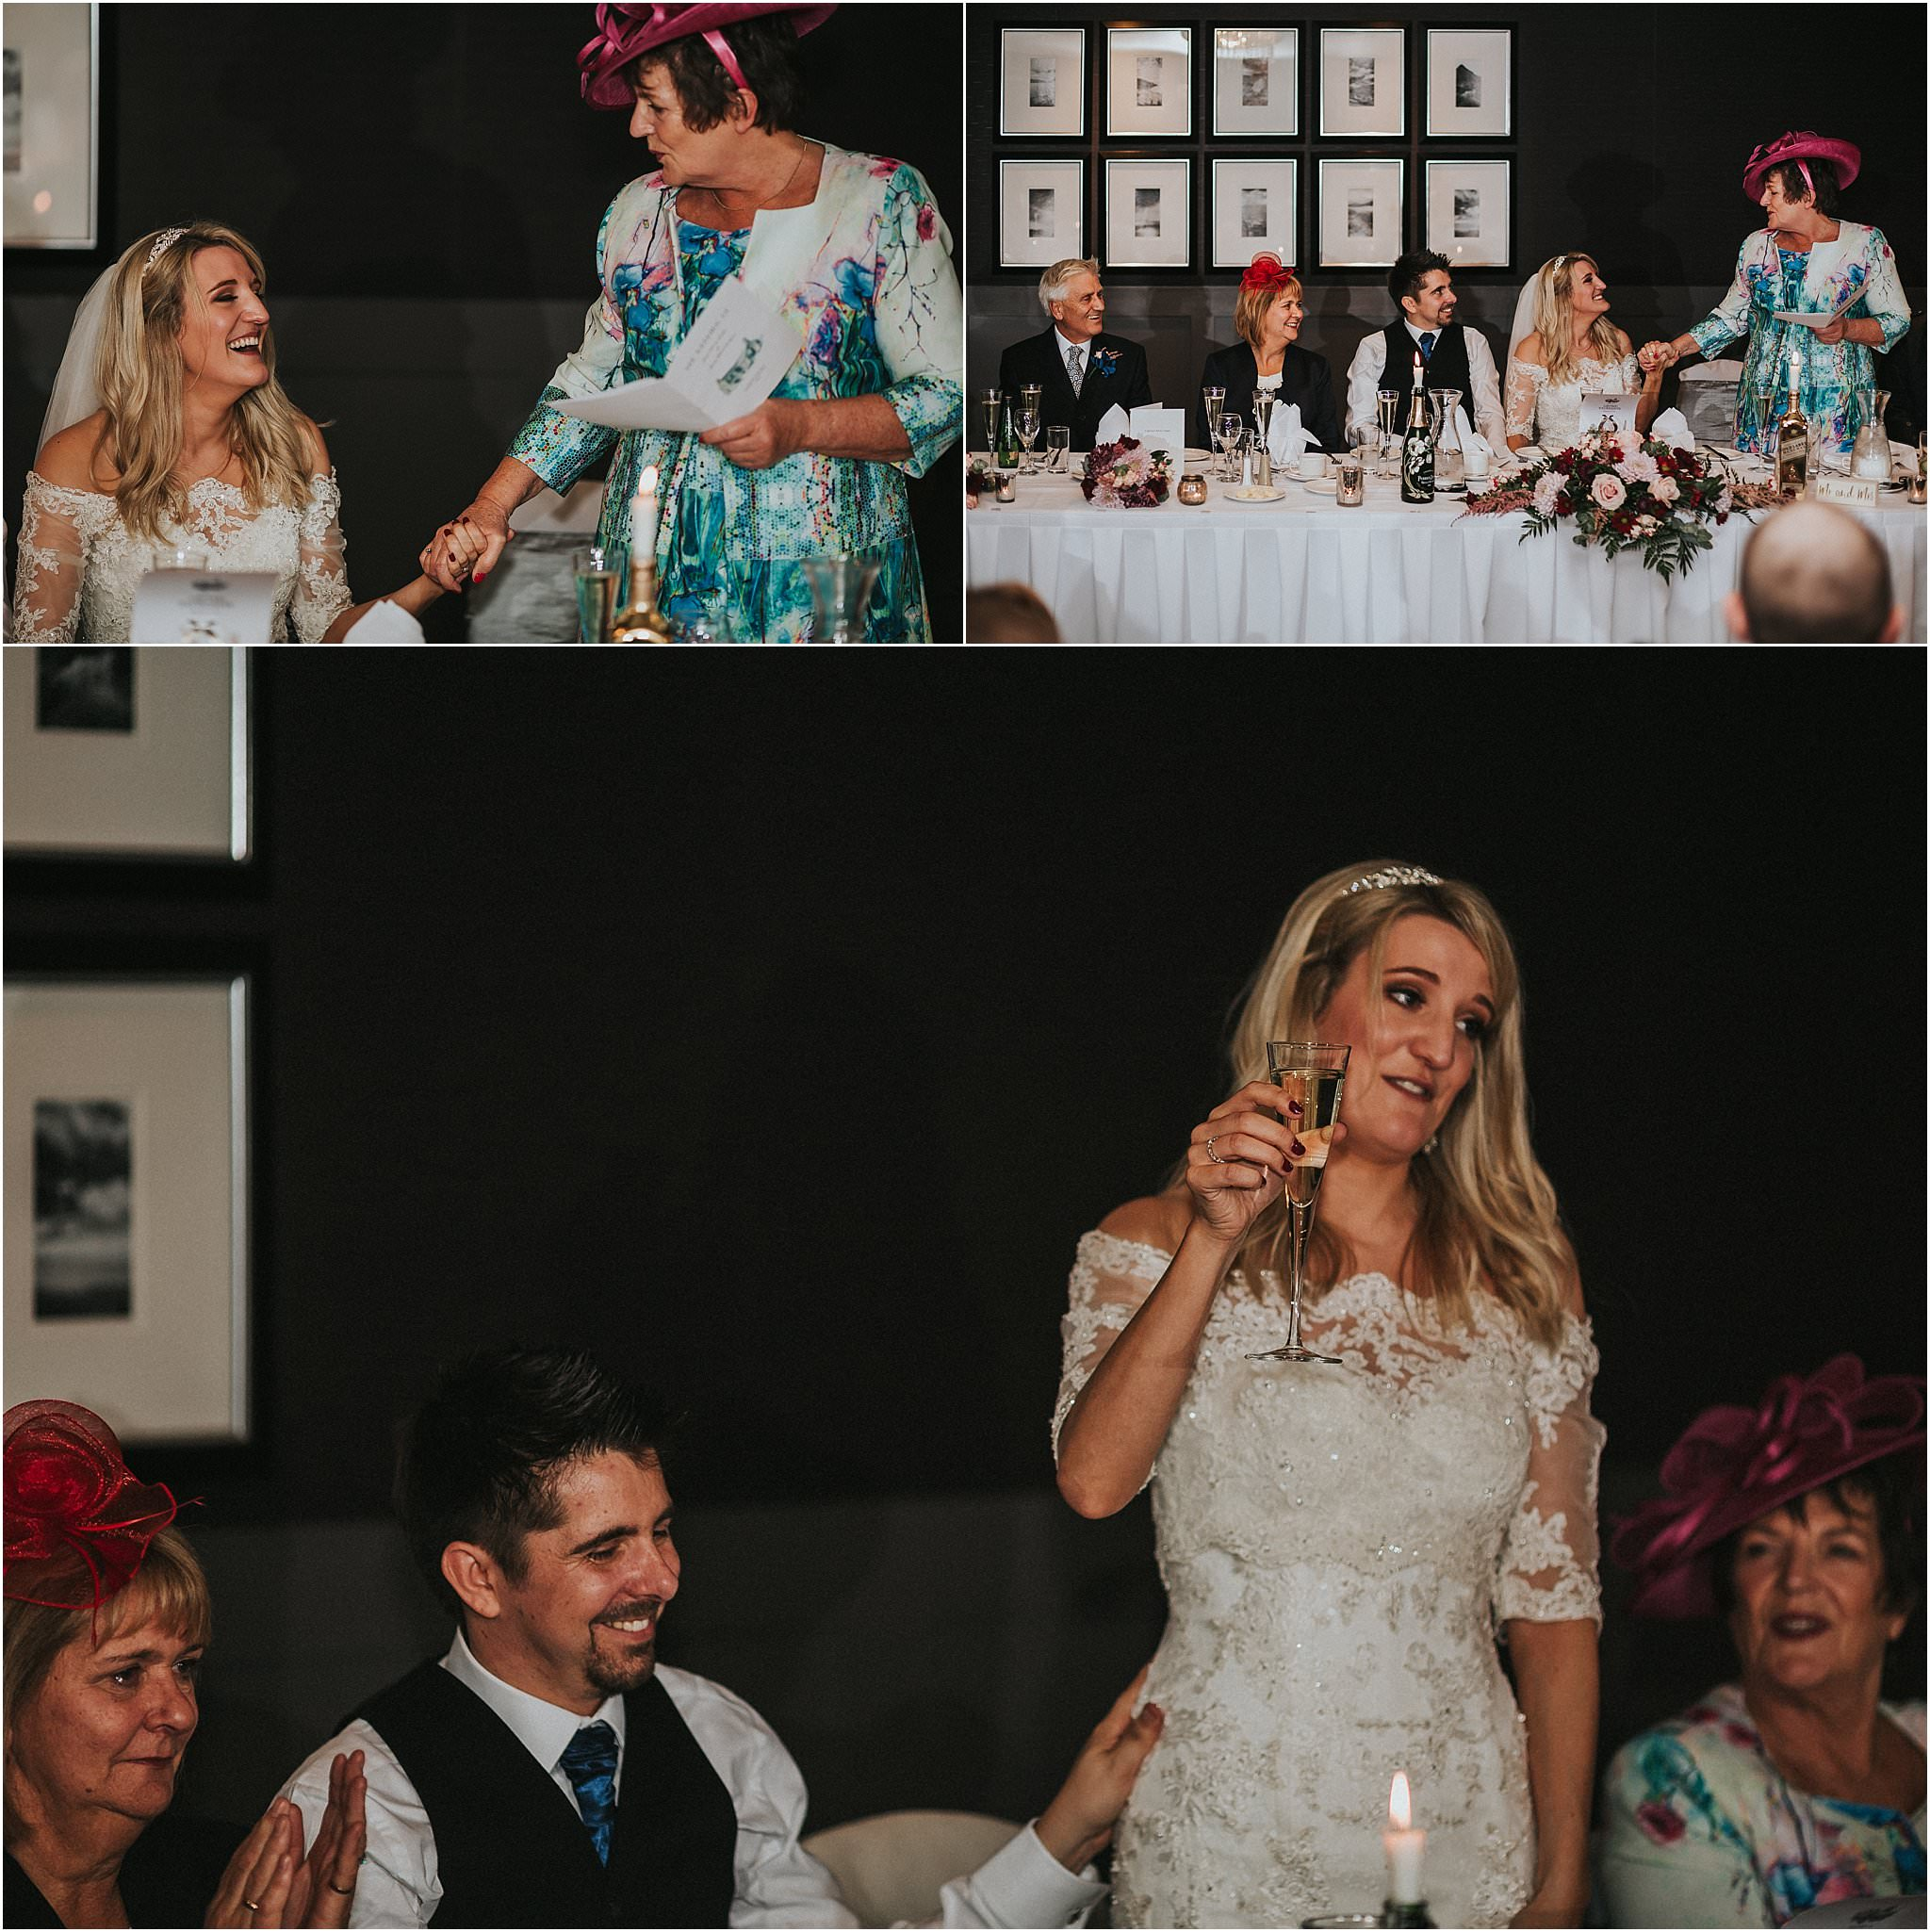 janie-garry-wedding36.jpg